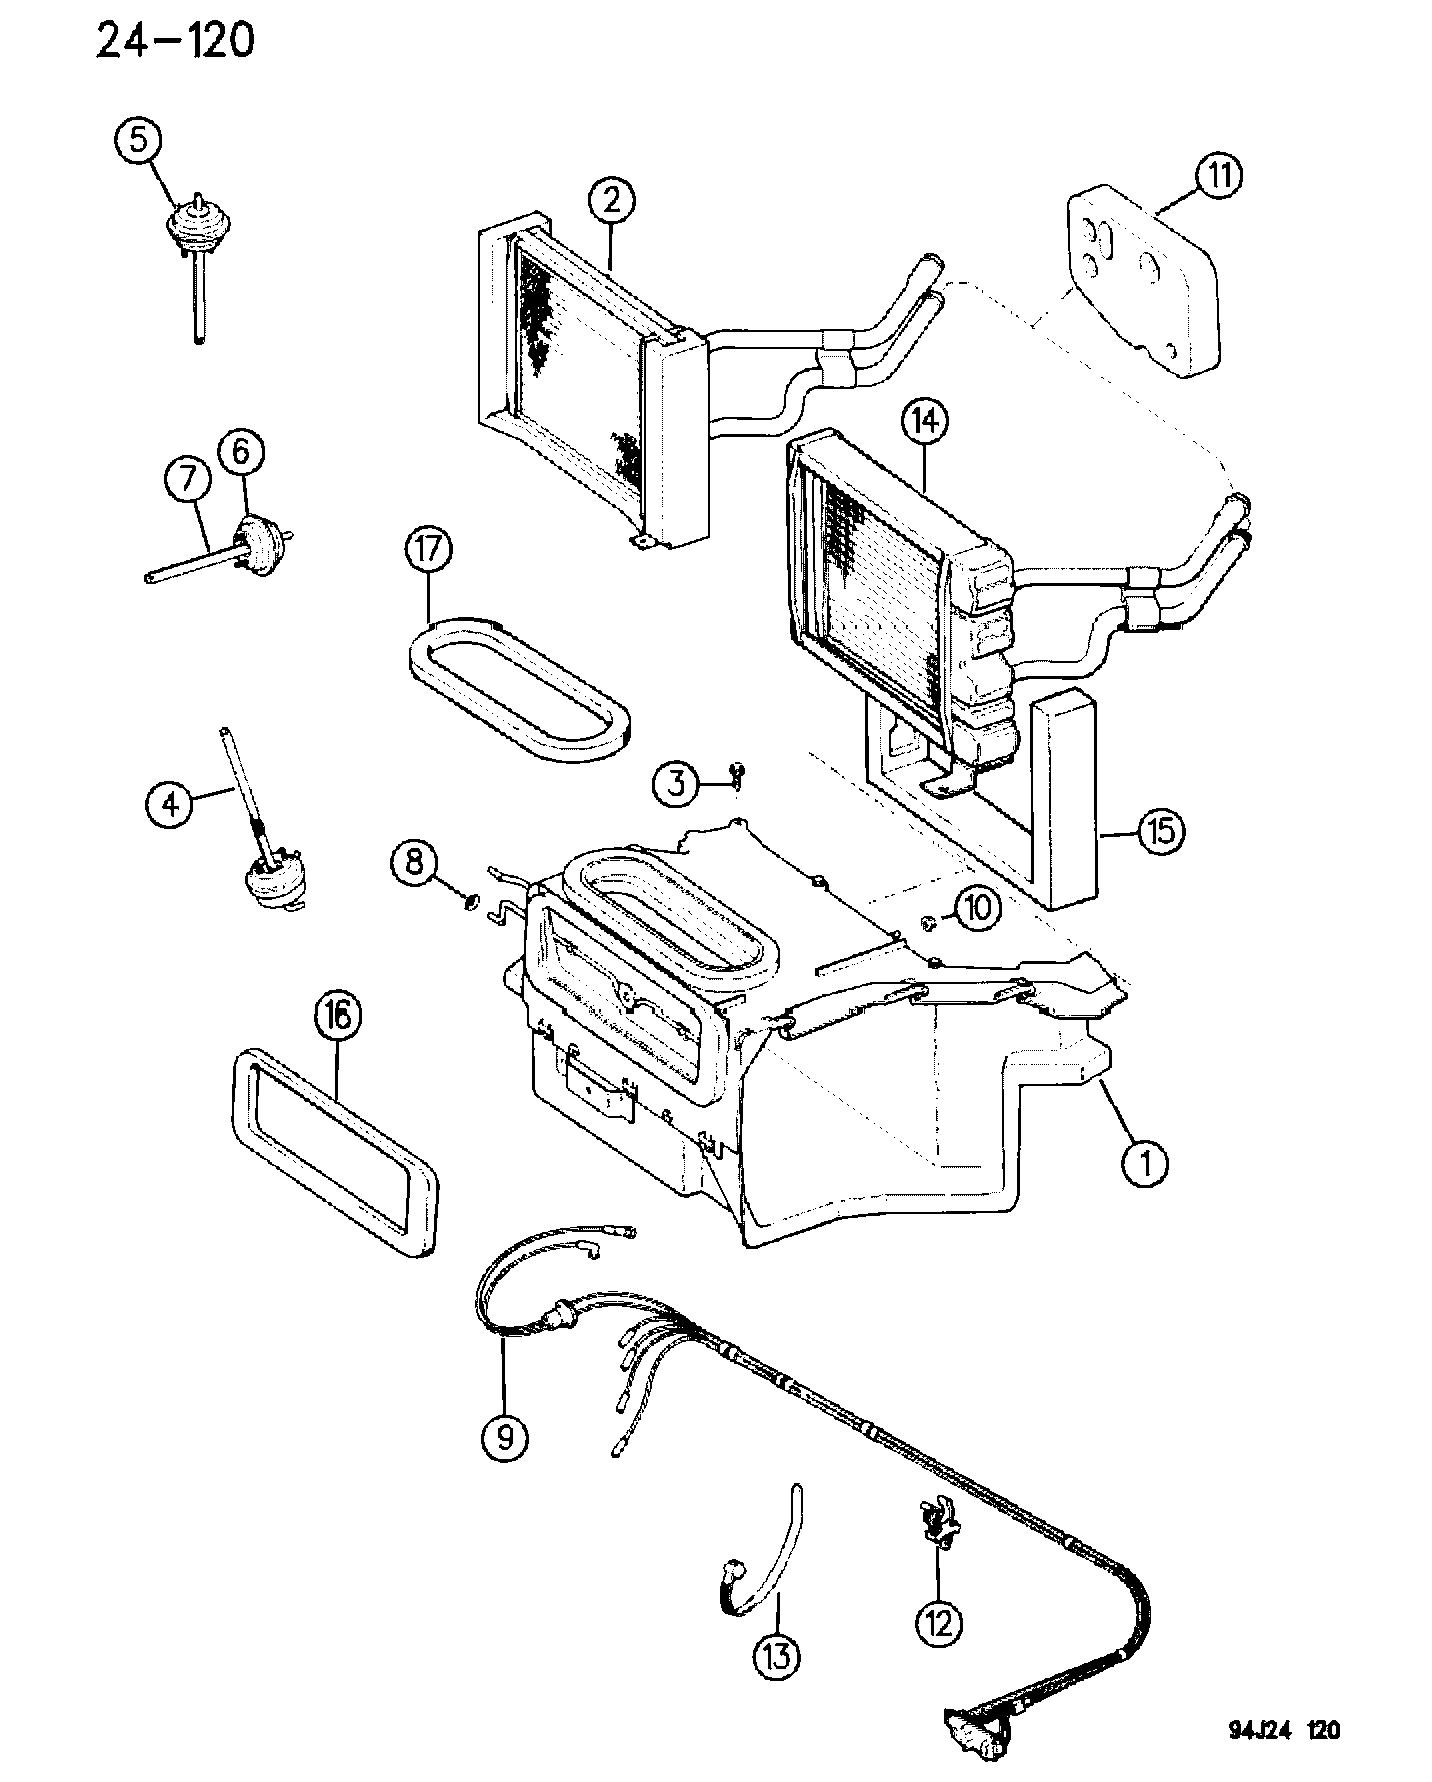 cj5 heater diagram wiring diagram